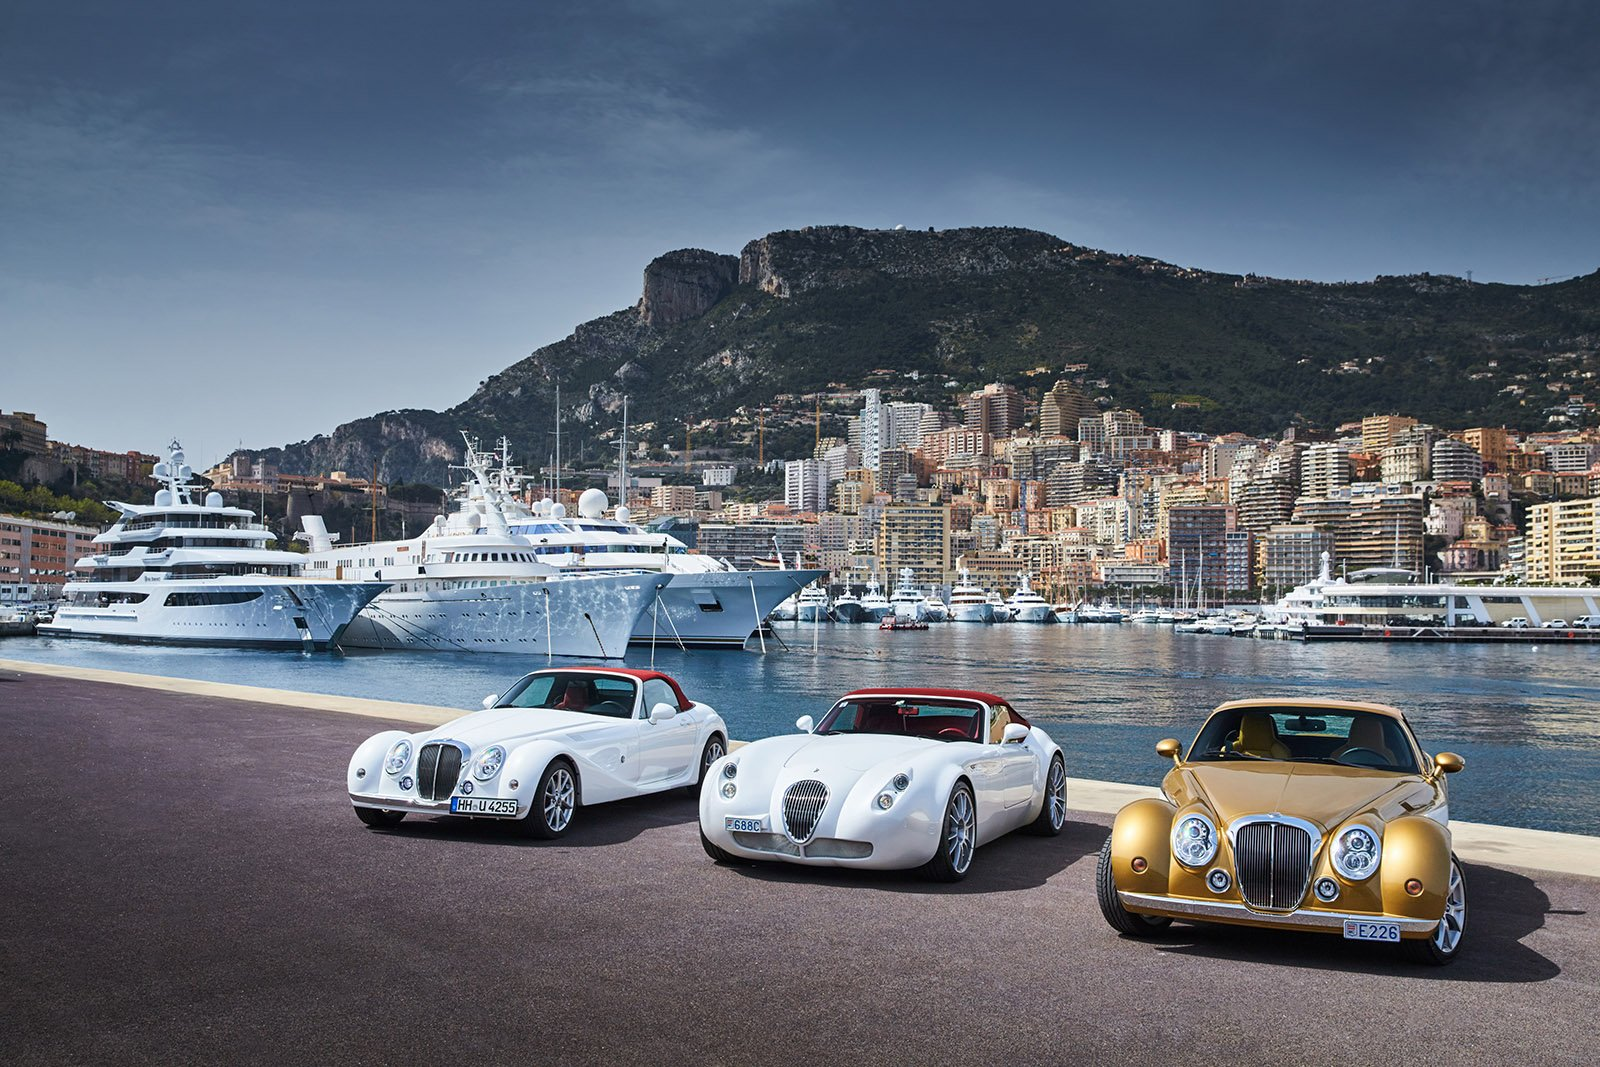 Luxury Cars in Monaco © Drozdin Vladimir - Shutterstock.com